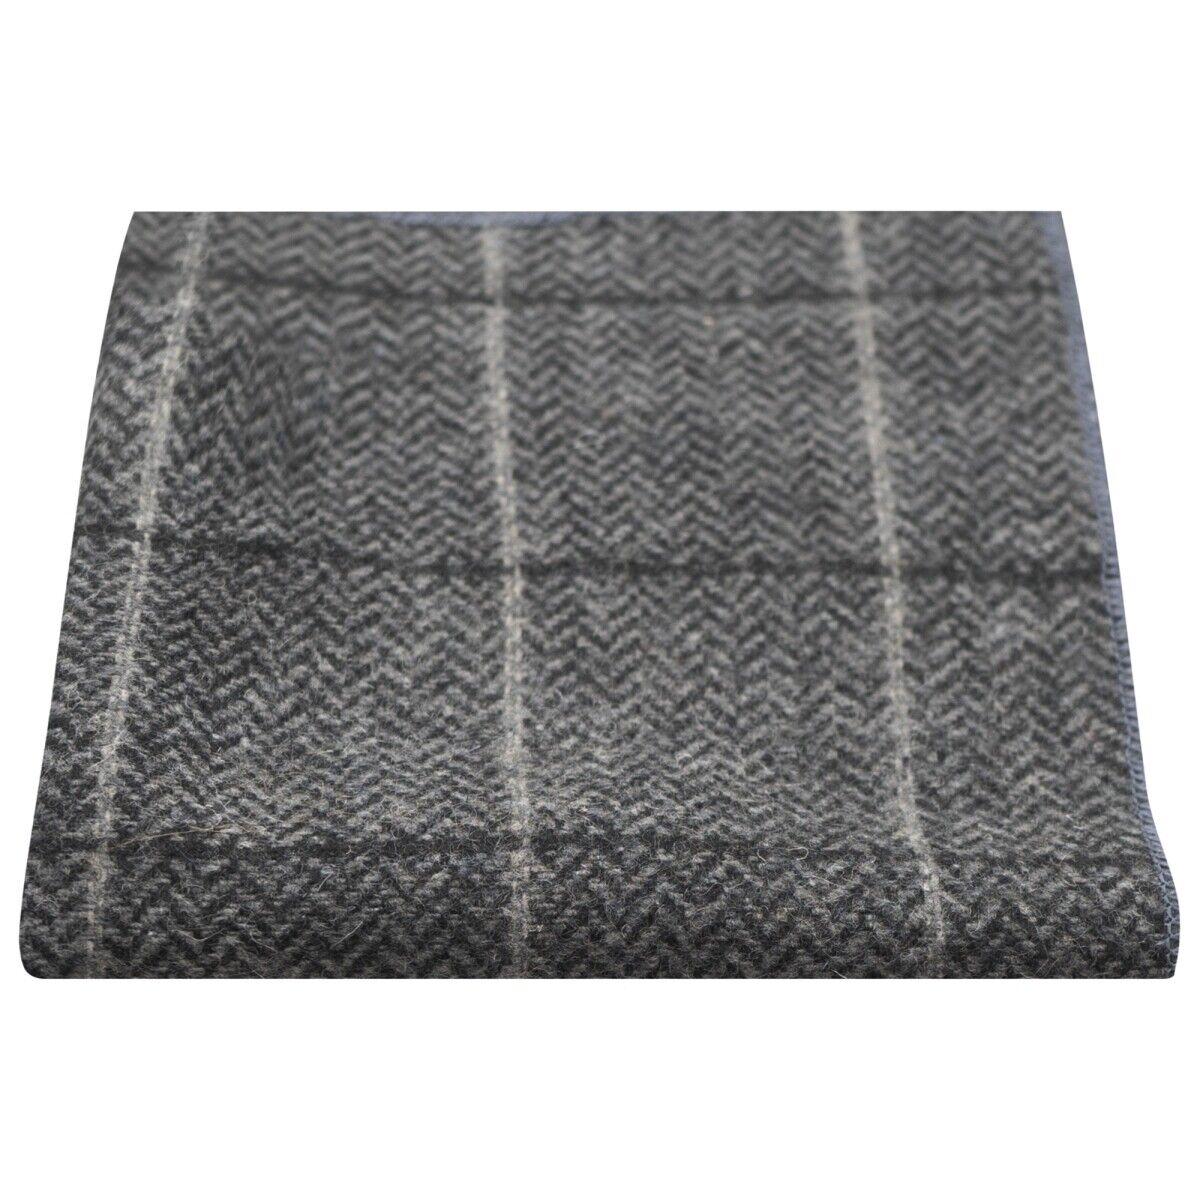 Luxury Graphite Grey Herringbone Check Tweed Pocket Square, Handkerchief